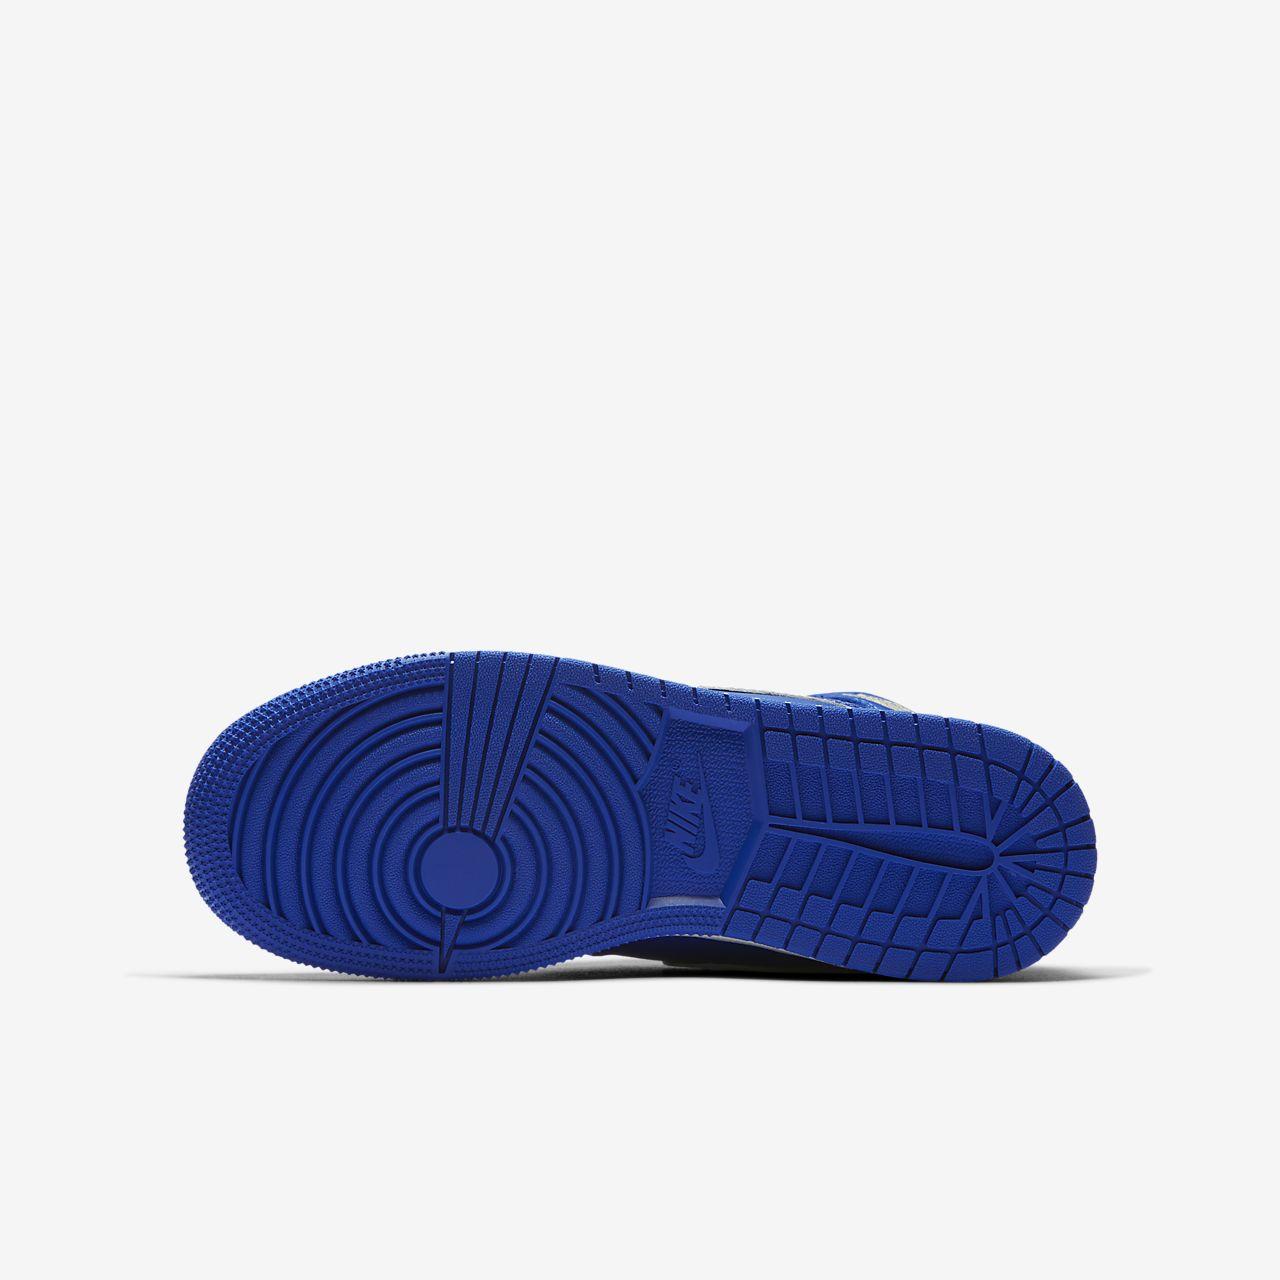 74b14883 Air Jordan 1 Retro High OG guttesko. Nike.com NO